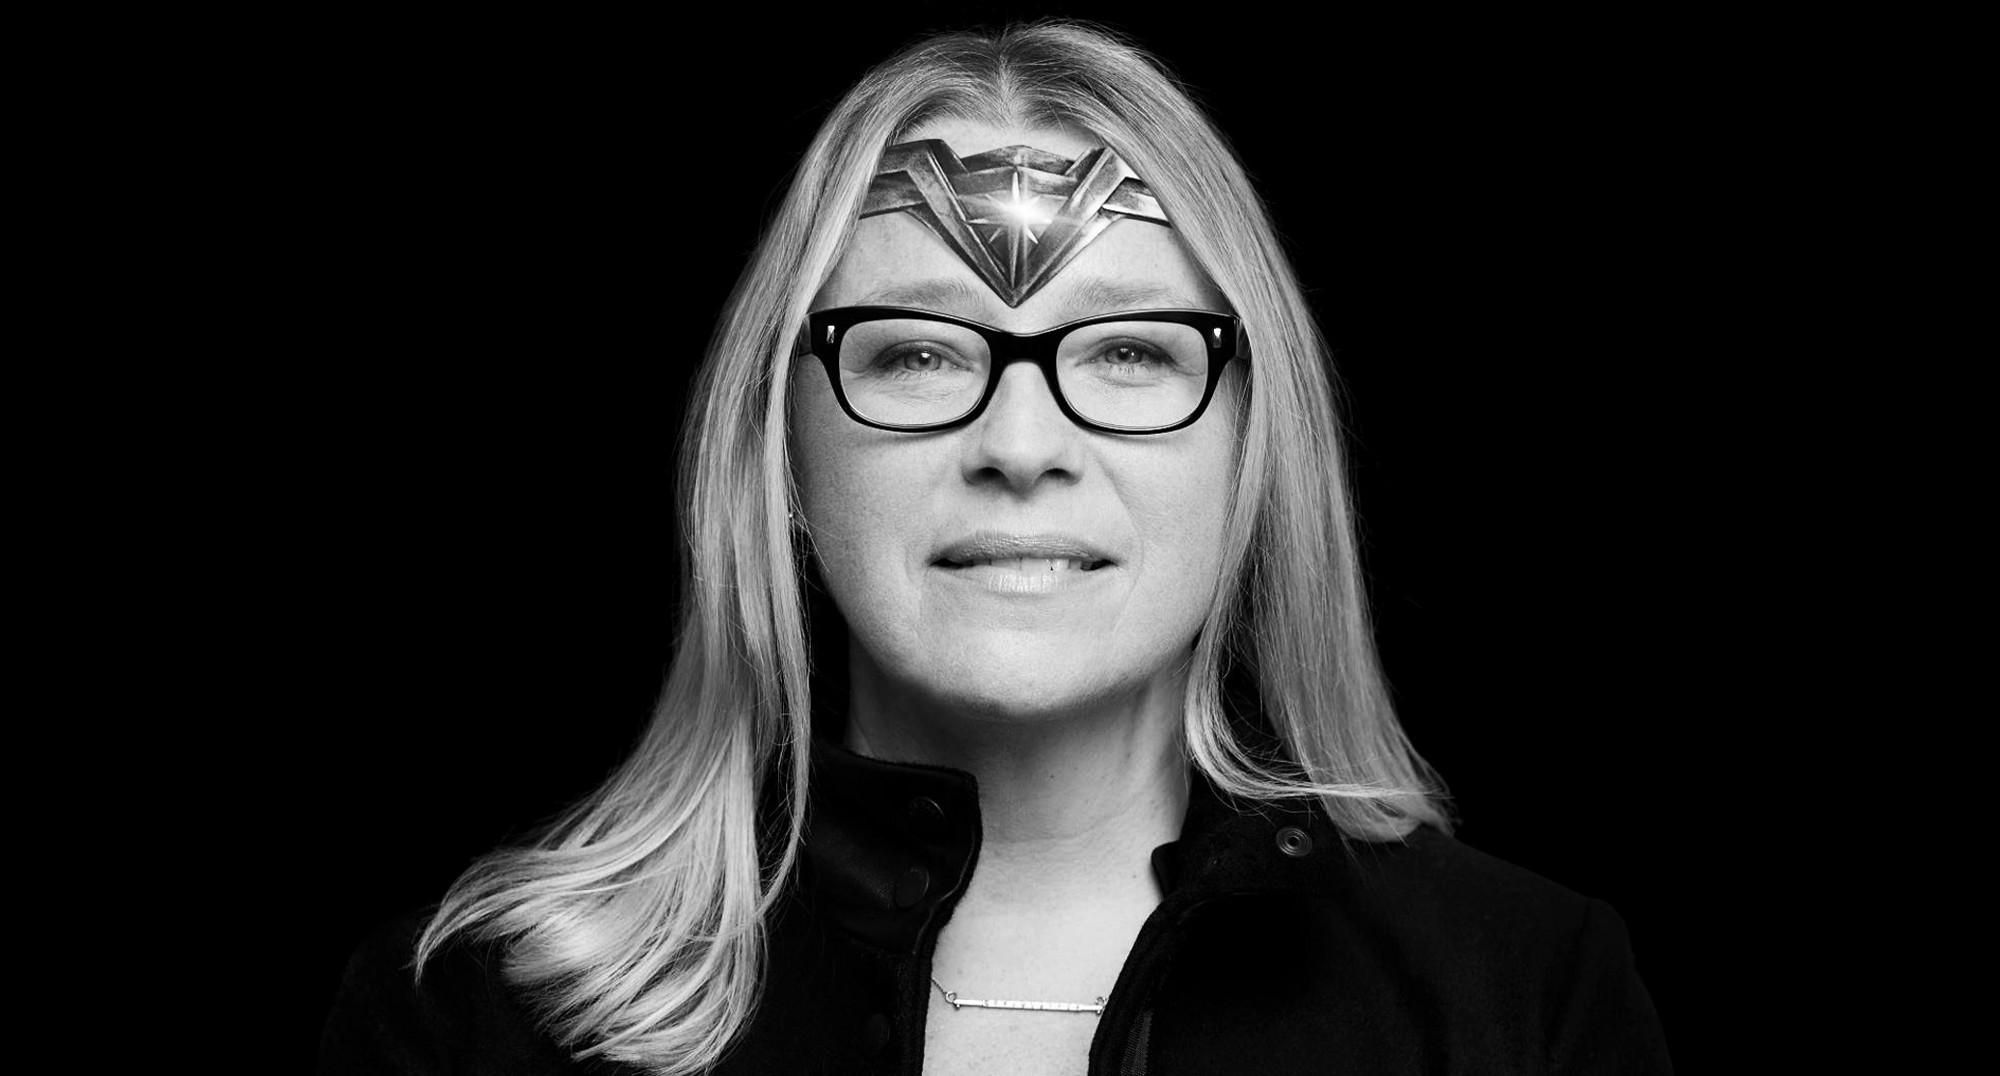 Heather Donaldson aka Lady Honor takes over Hollywood